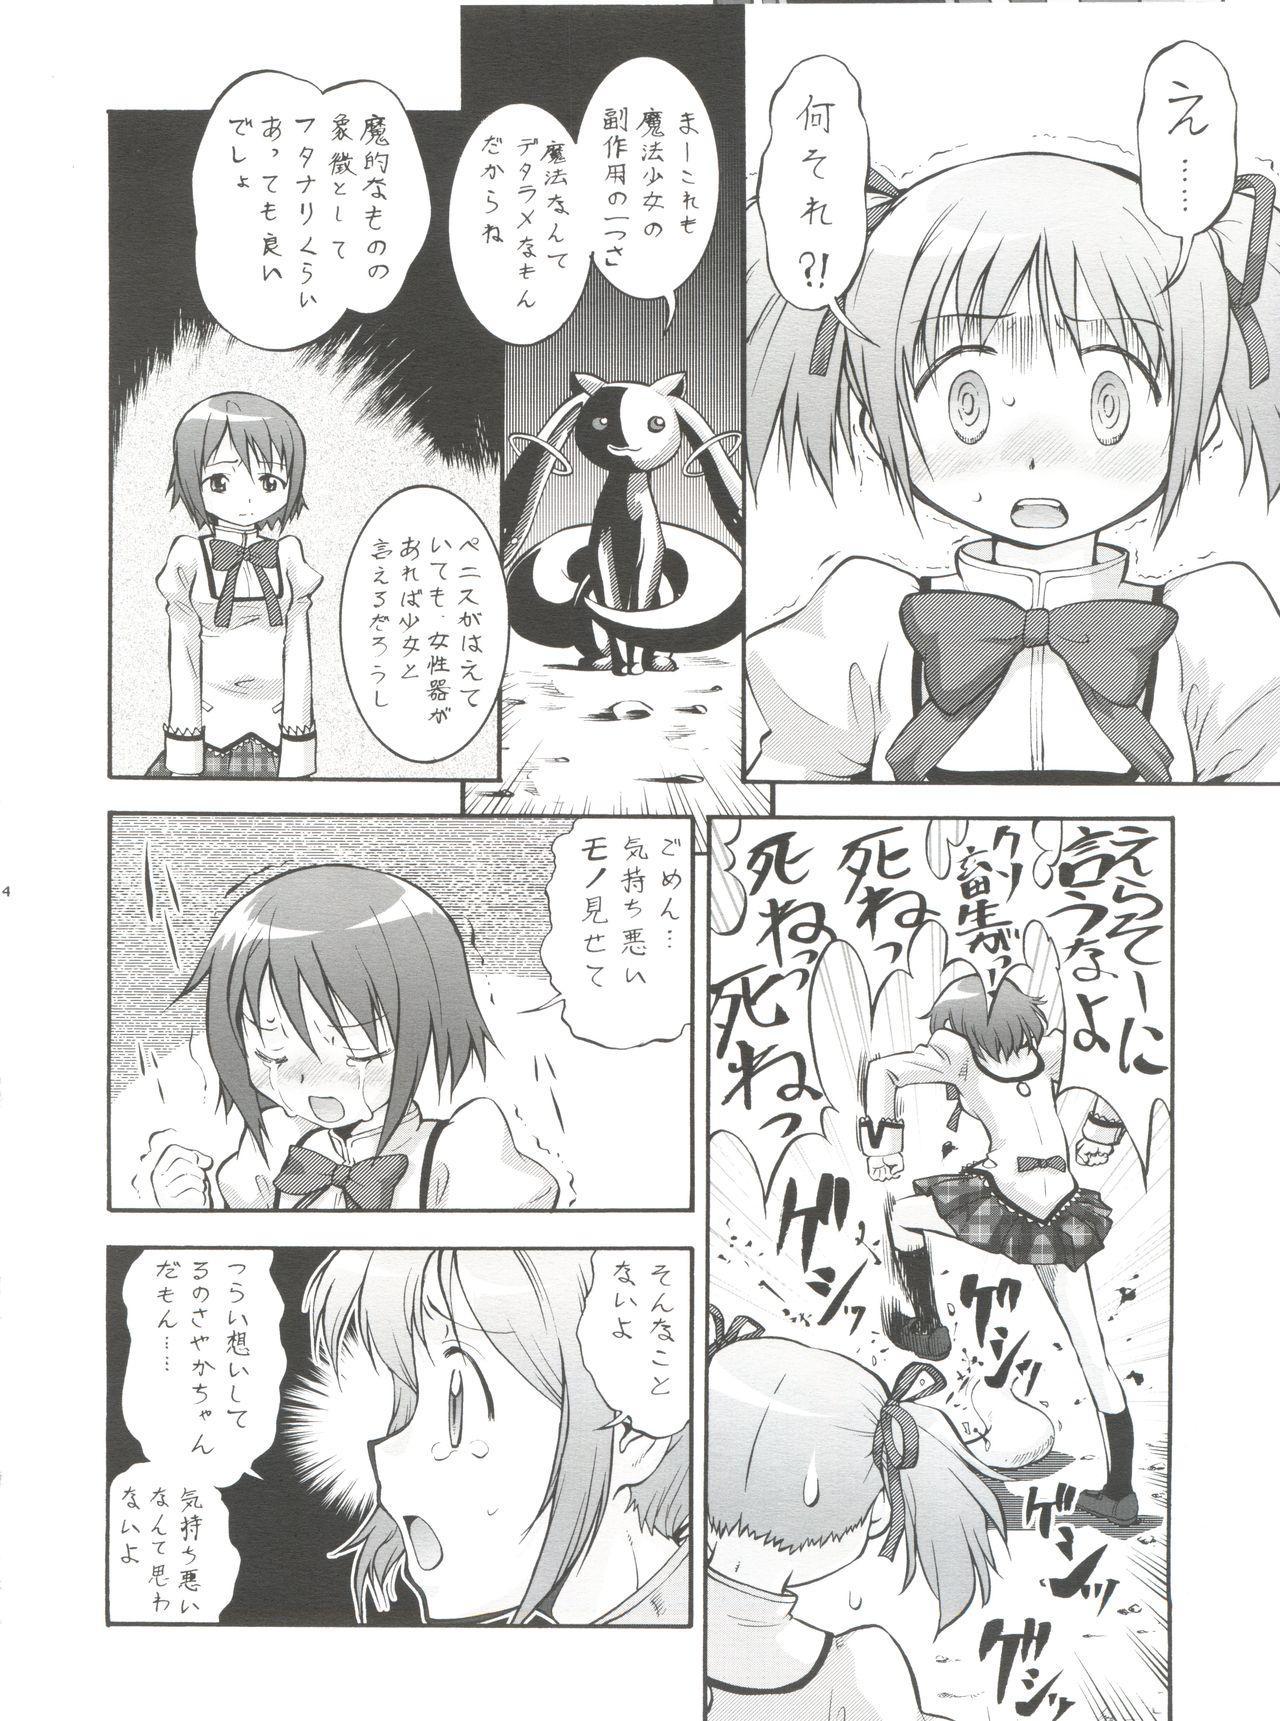 Mahou Shoujo Majo ka? Maji ka? 2